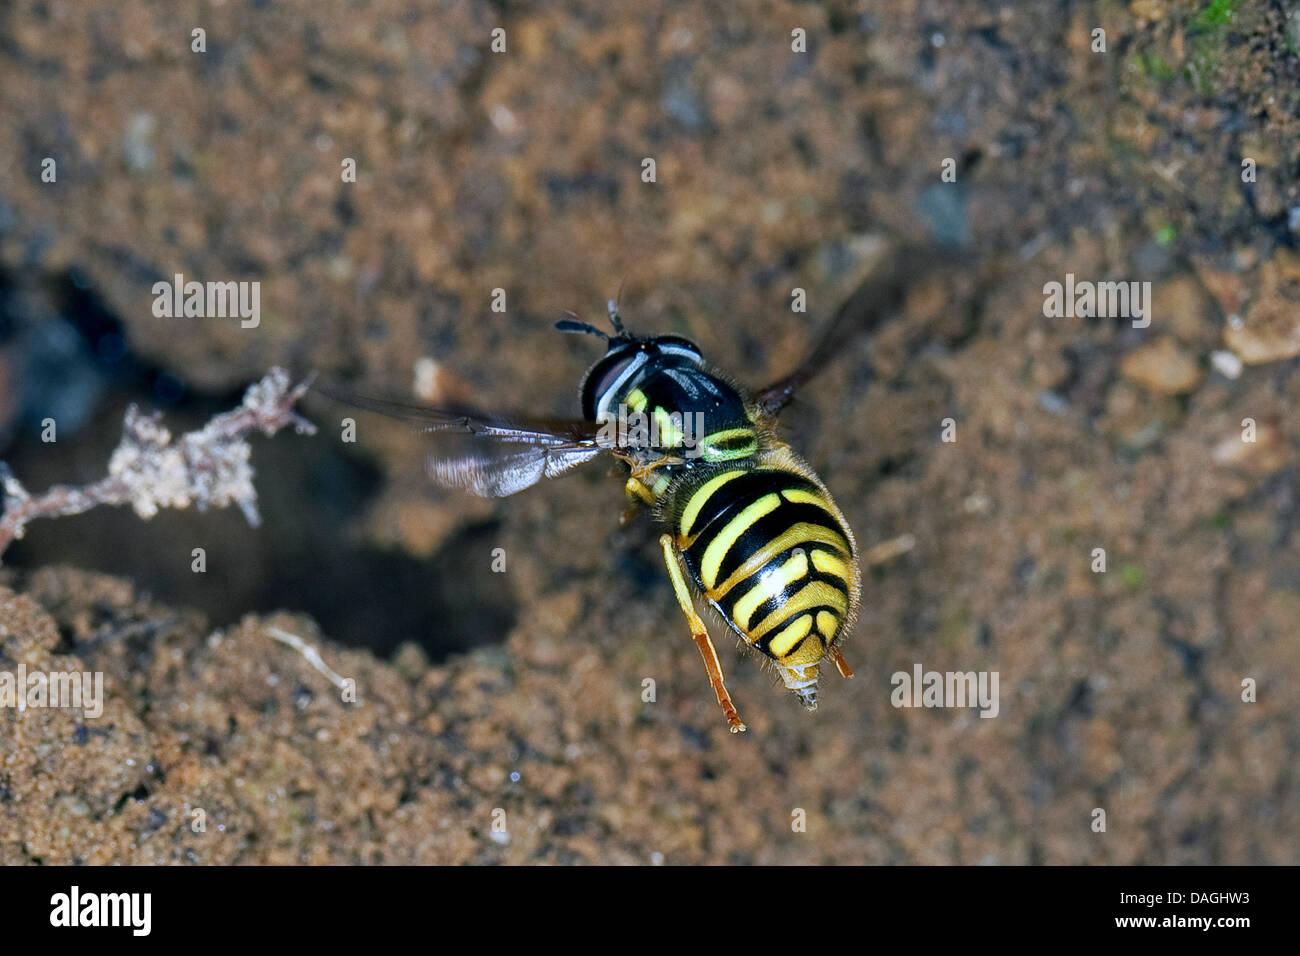 Spaete-Wespen-Schwebfliege (Chrysotoxum arcuatum, Chrysotoxum fasciatum), imitates the look of wasps for protection - Stock Image